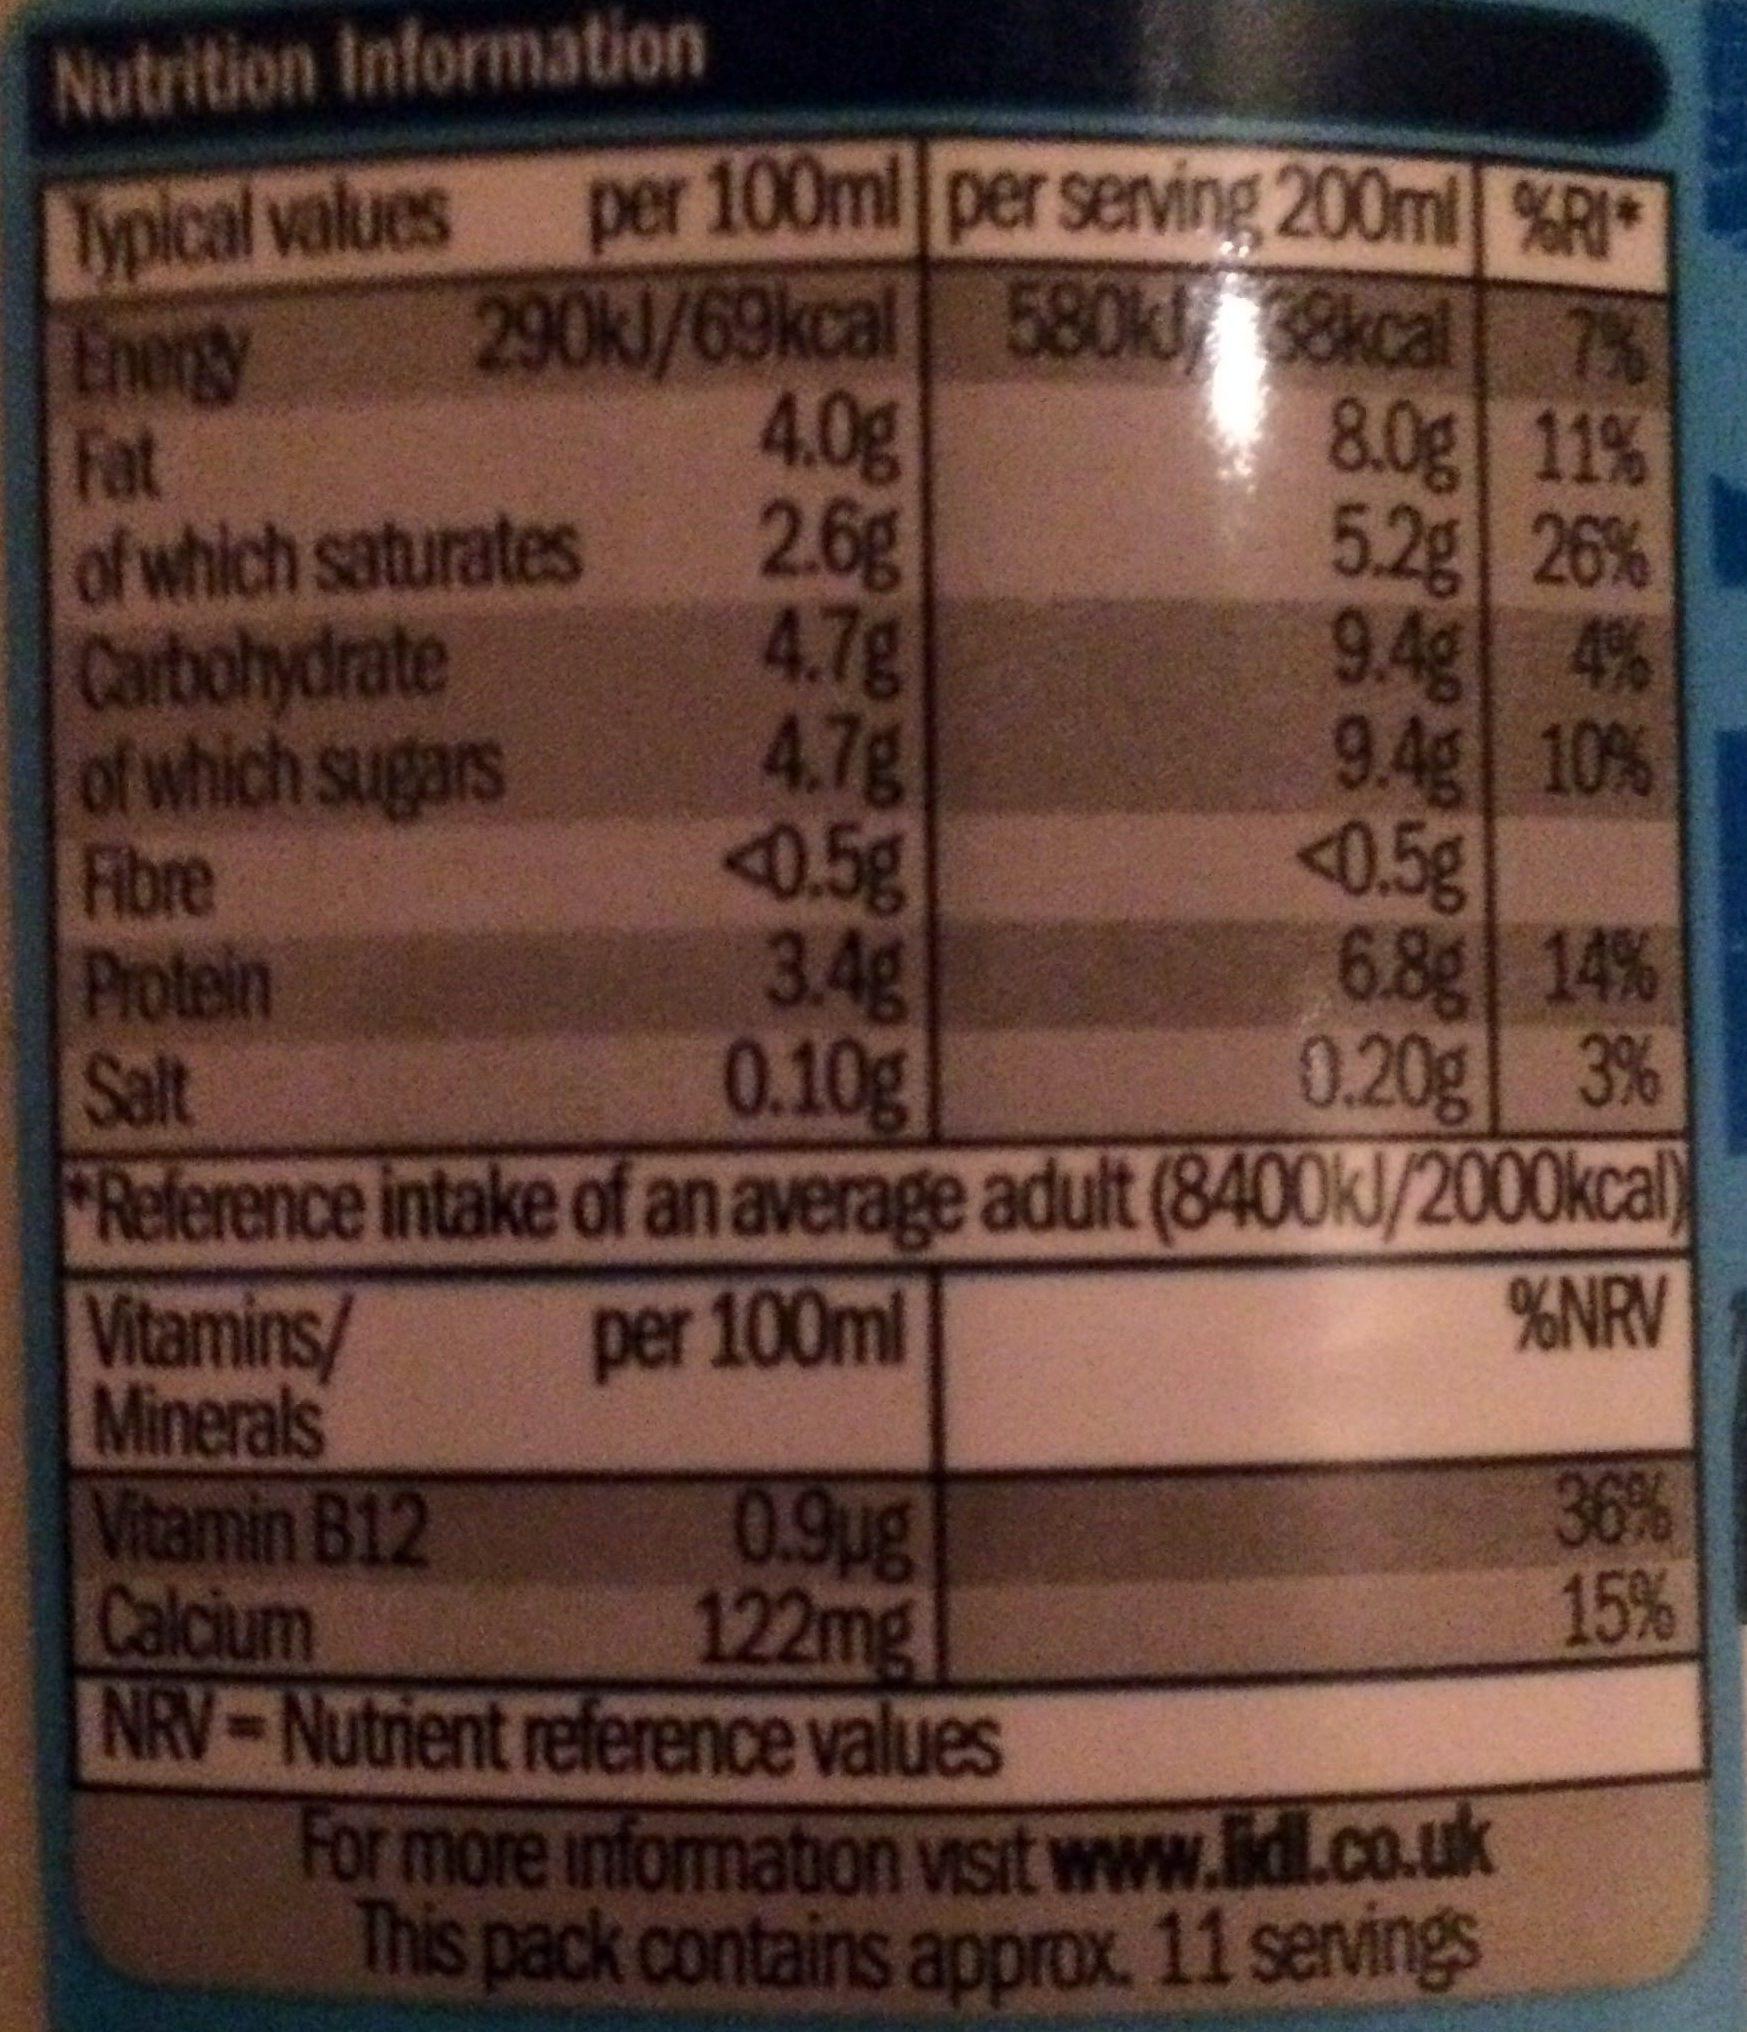 british whole milk - Nutrition facts - en